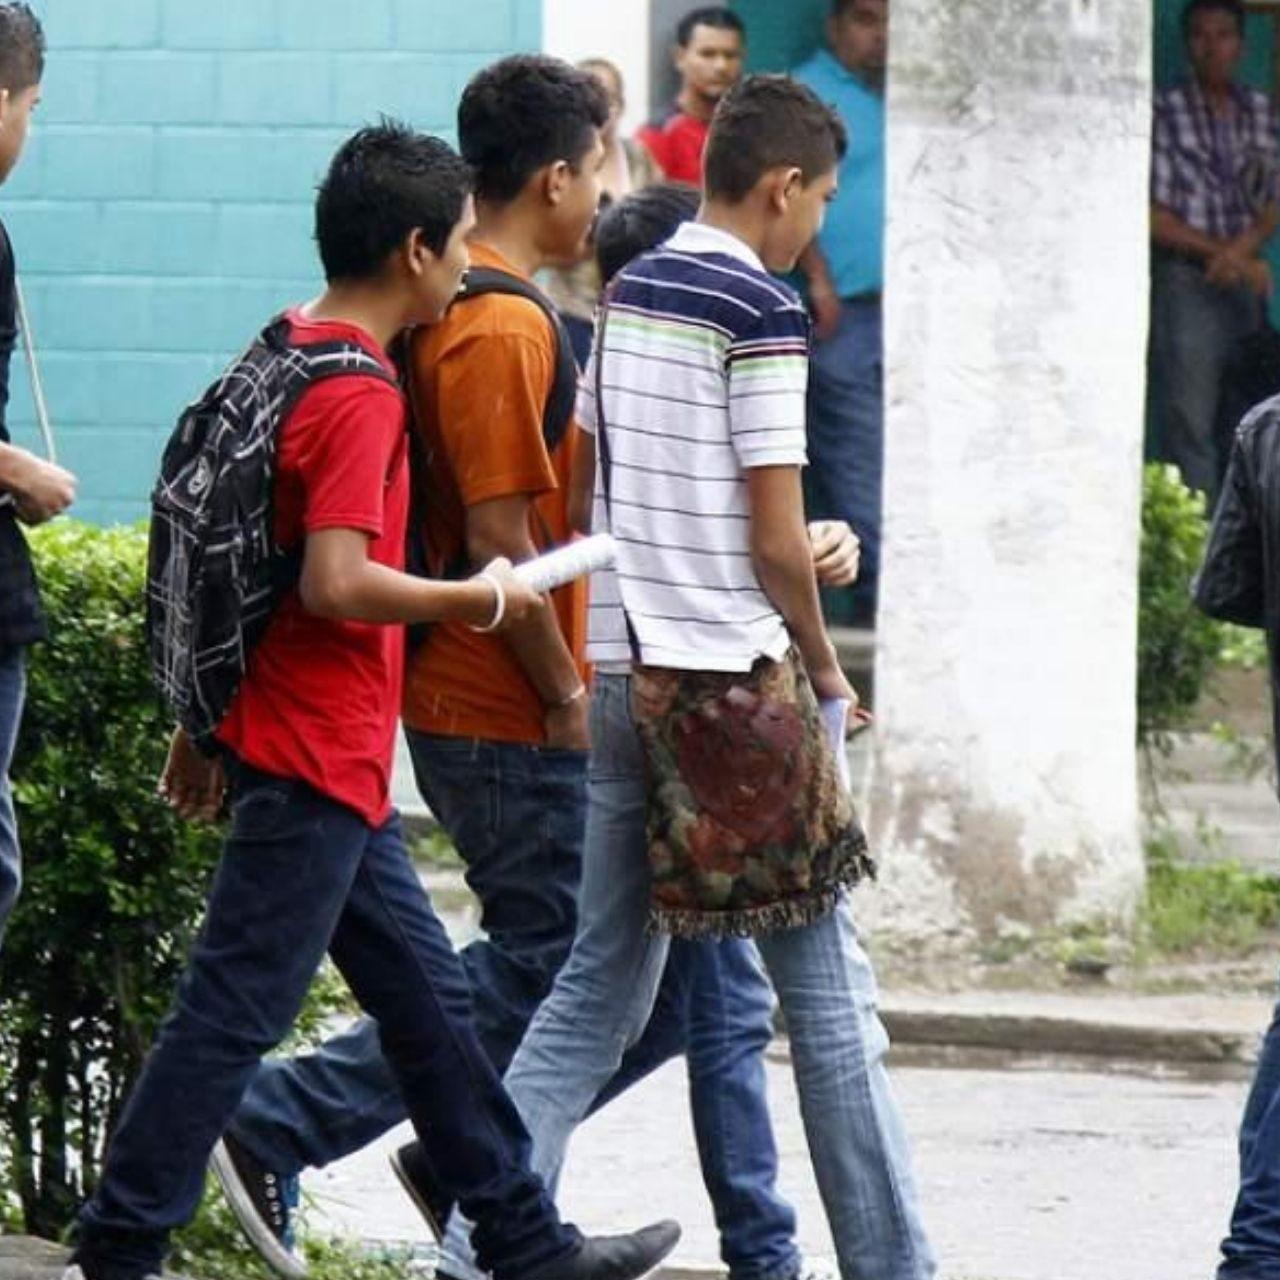 Falta de empleo en imaginario colectivo de menores de Olancho e Intibucá que aspiran migrar